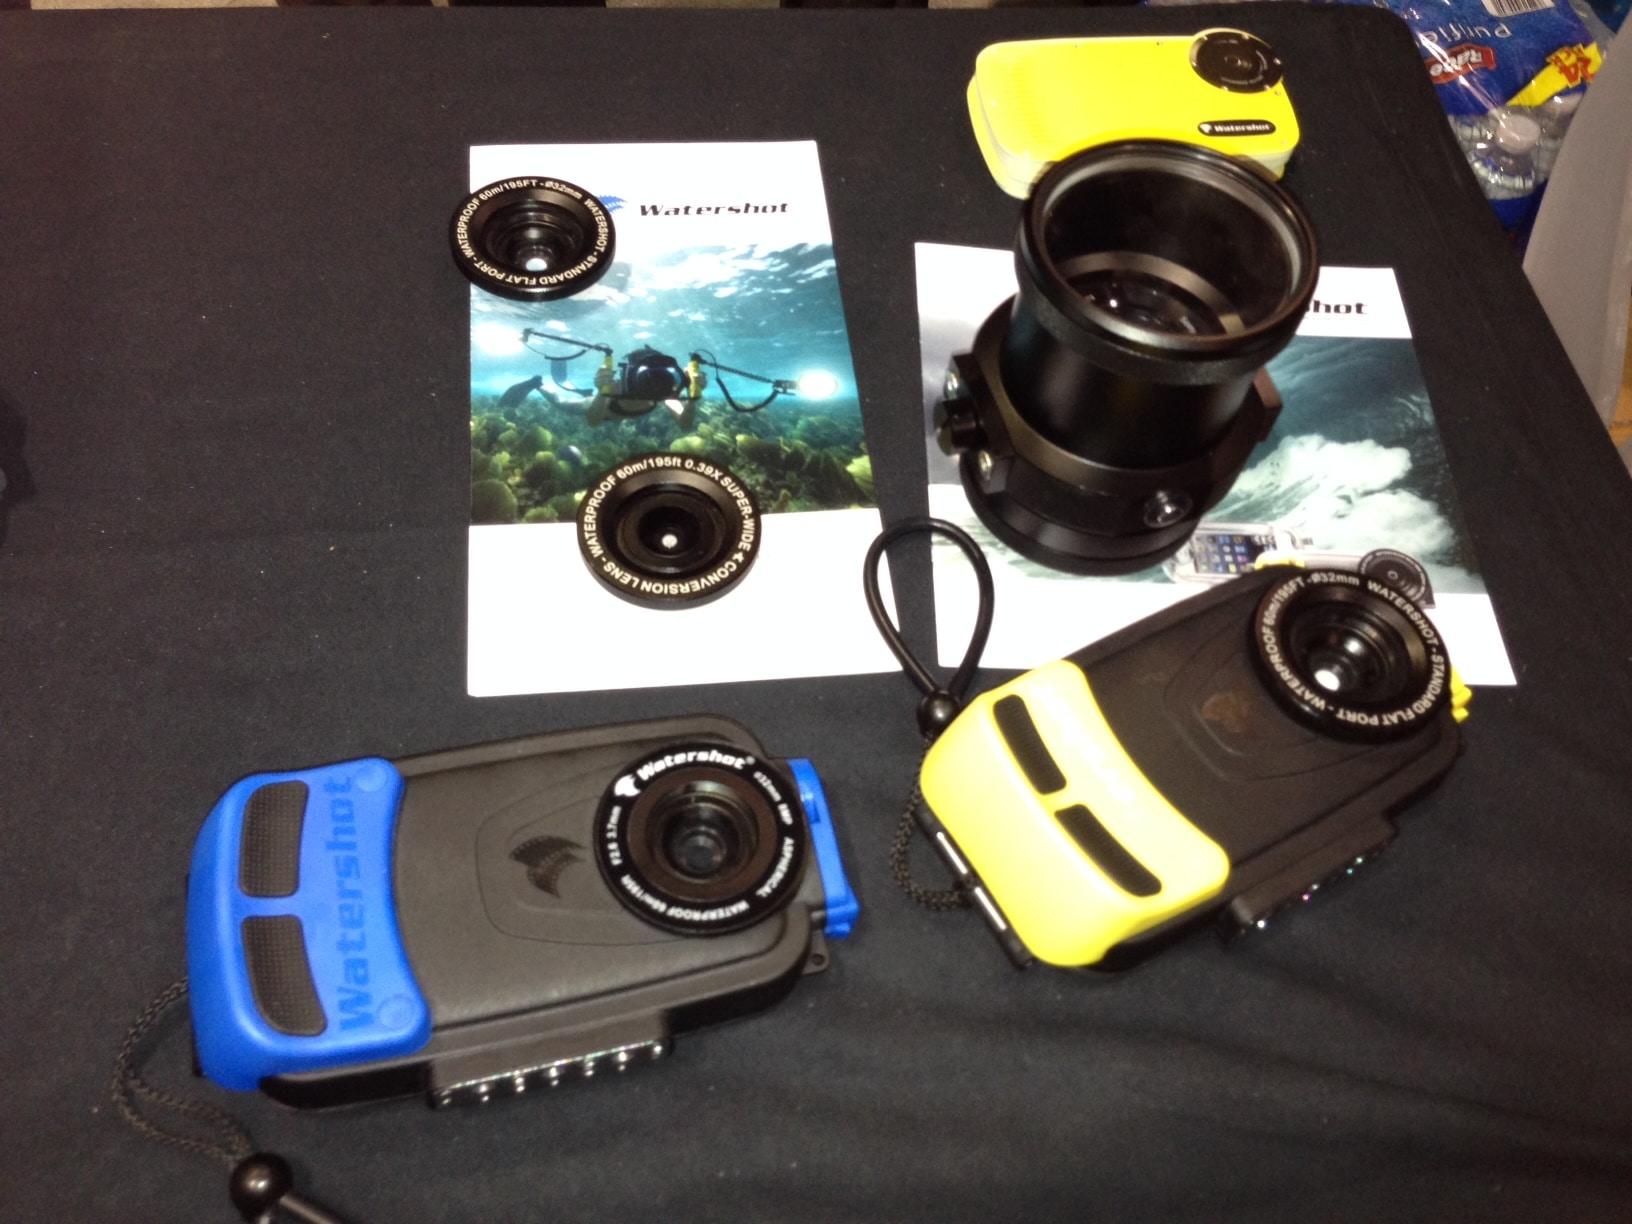 Watershot Unveils Prototype Underwater Camera DSLR Lens For iPhone & Galaxy